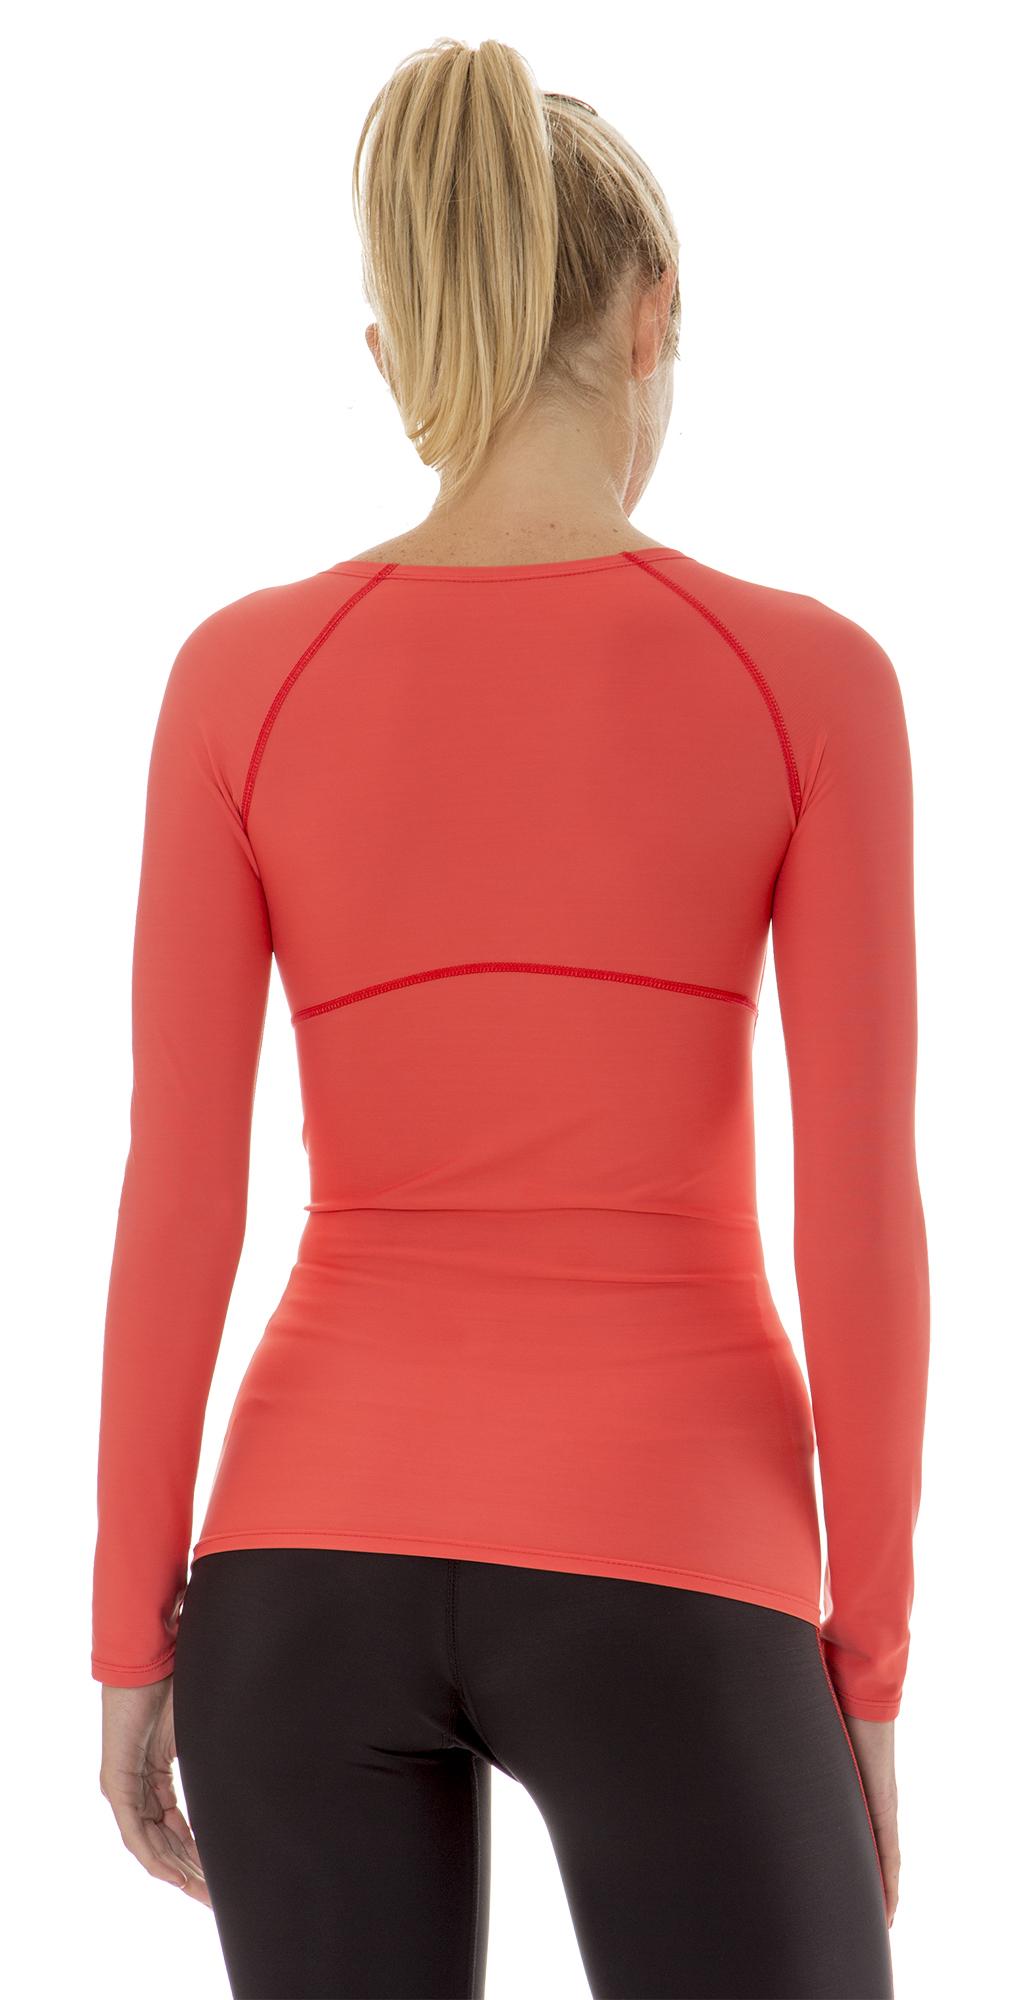 Aeroskin dry womens compression long sleeve running shirt for Long sleeve running shirt womens